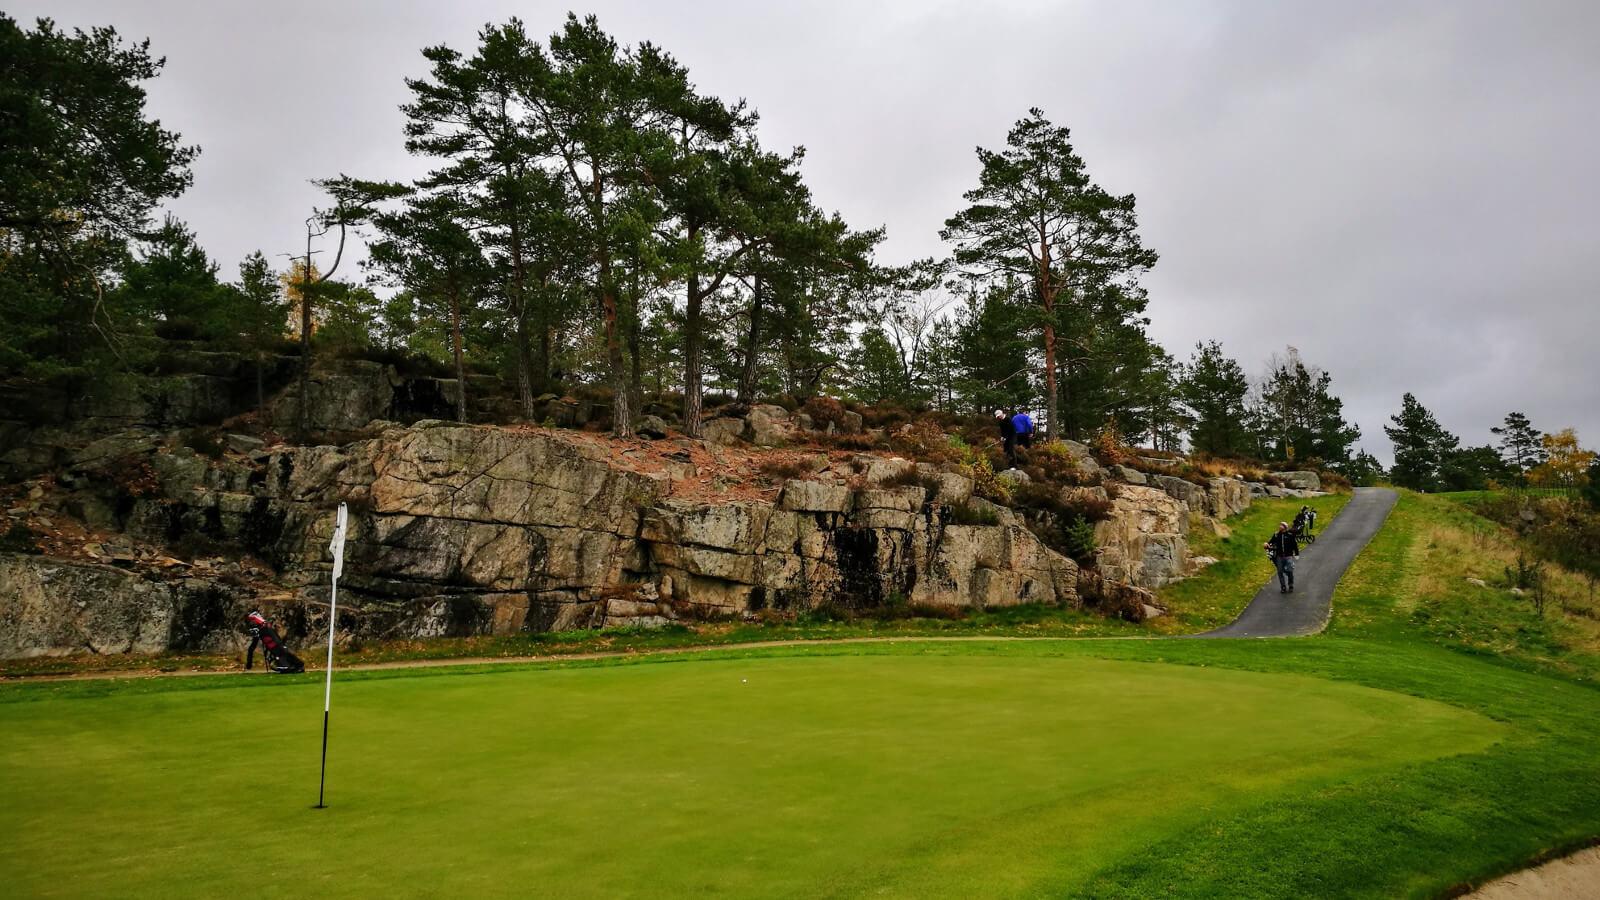 Hull 14, Kragerø Golfklubb